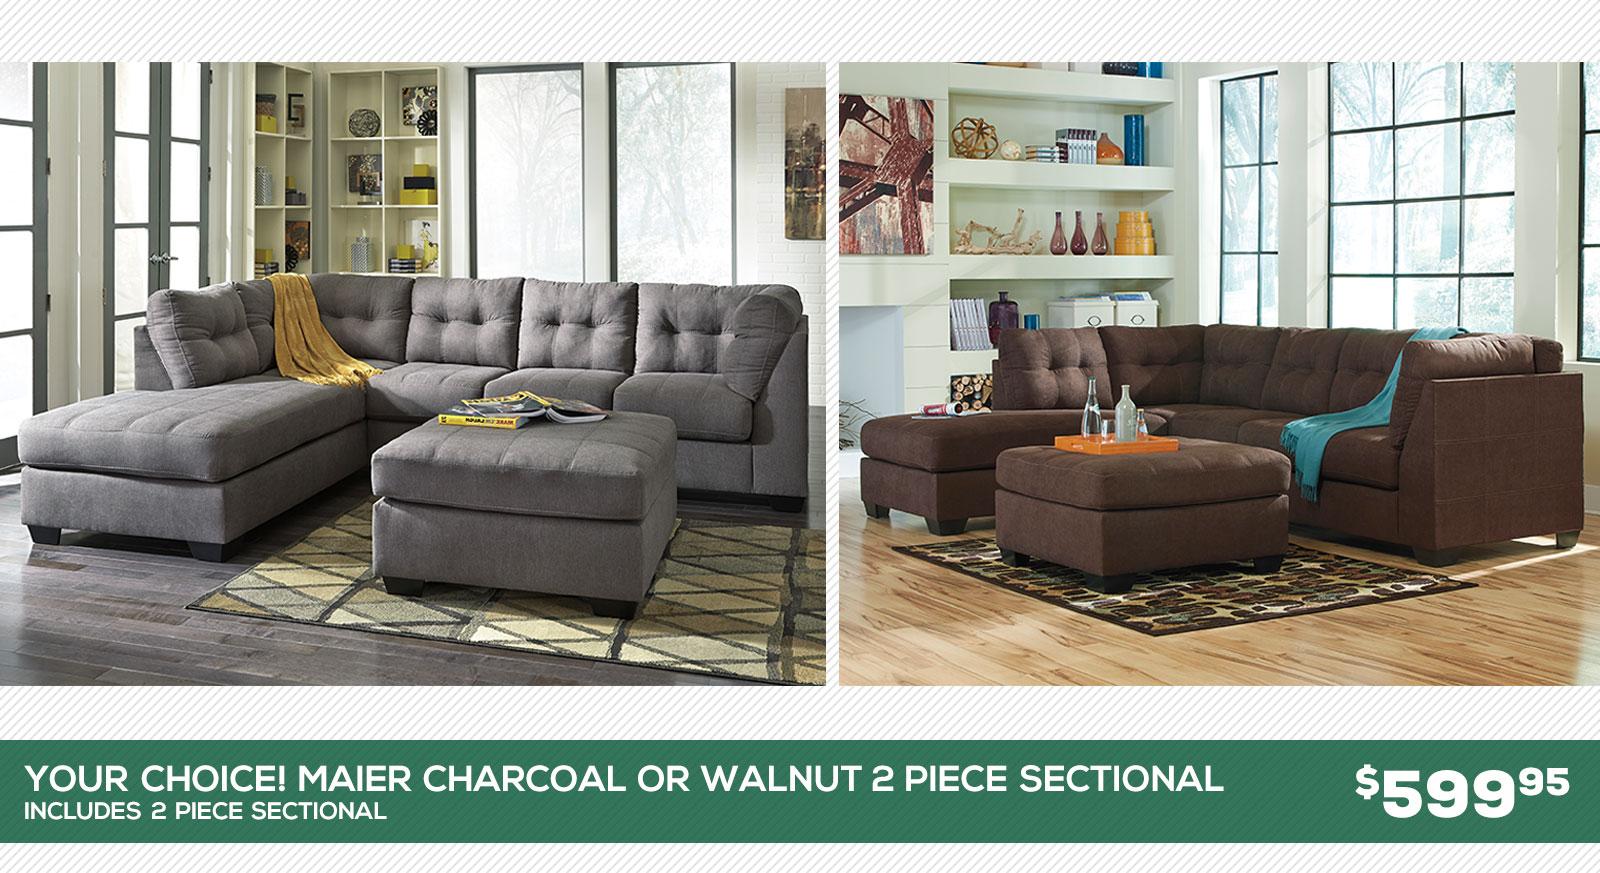 Ordinaire Furniture, Appliances, Electronics, Mattresses In Longview, Tyler And  Marshall TX | Adams Furniture U0026 Appliance